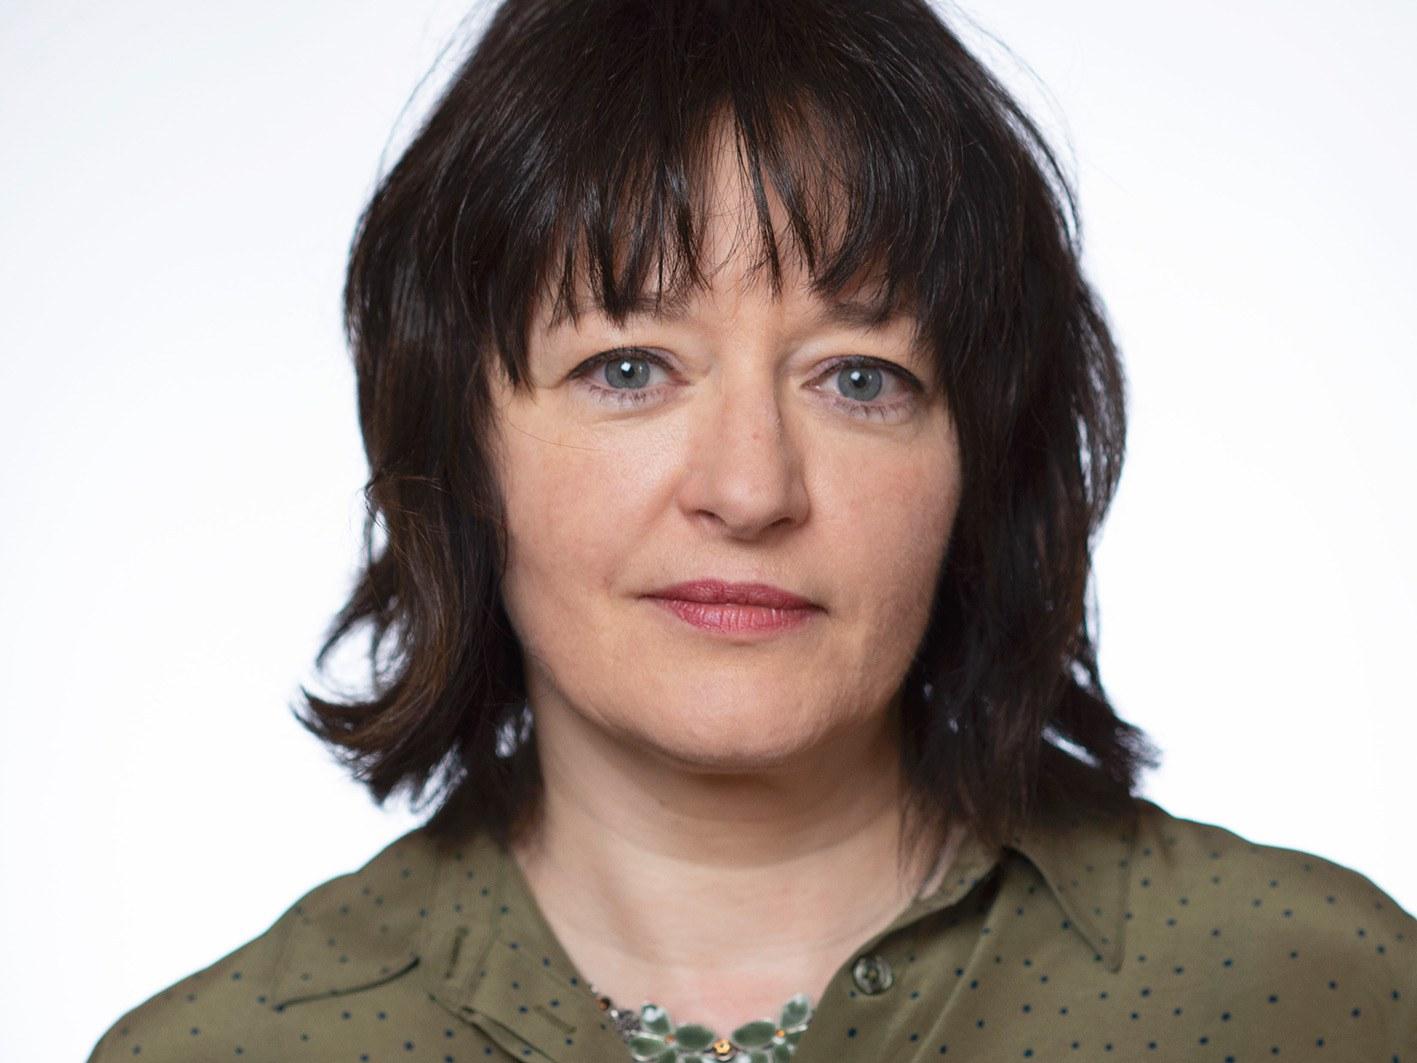 Prof. Dr. Britta Hartmann